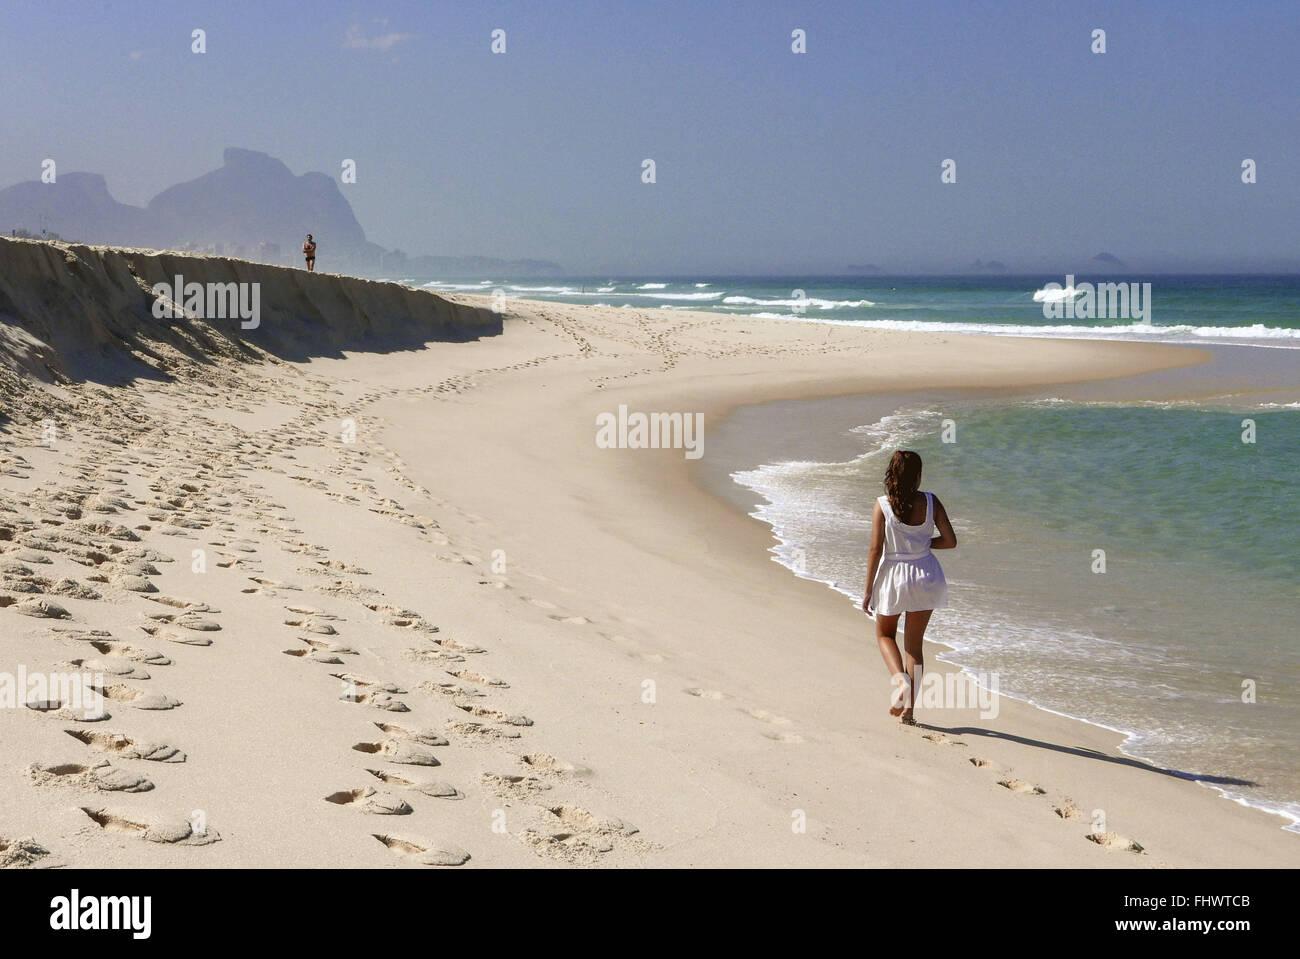 Adolescente caminhando na Praia da Reserva na Barra da Tijuca Imagen De Stock